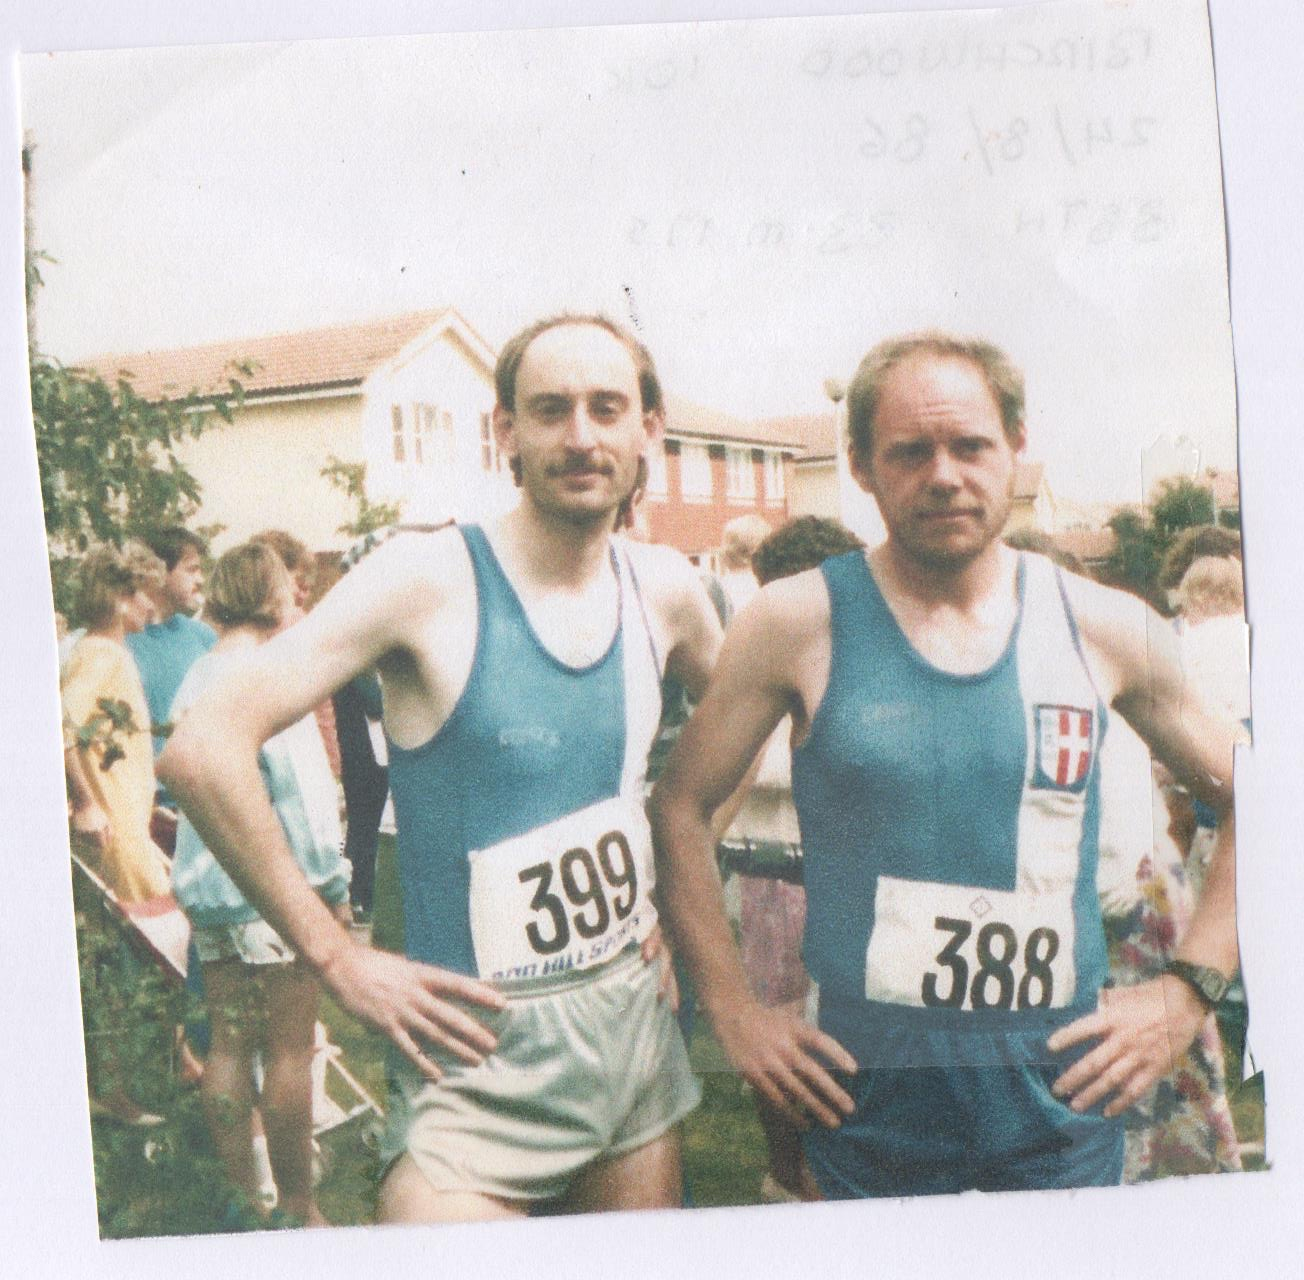 Remembering Mick 'Wilky' Wilkinson